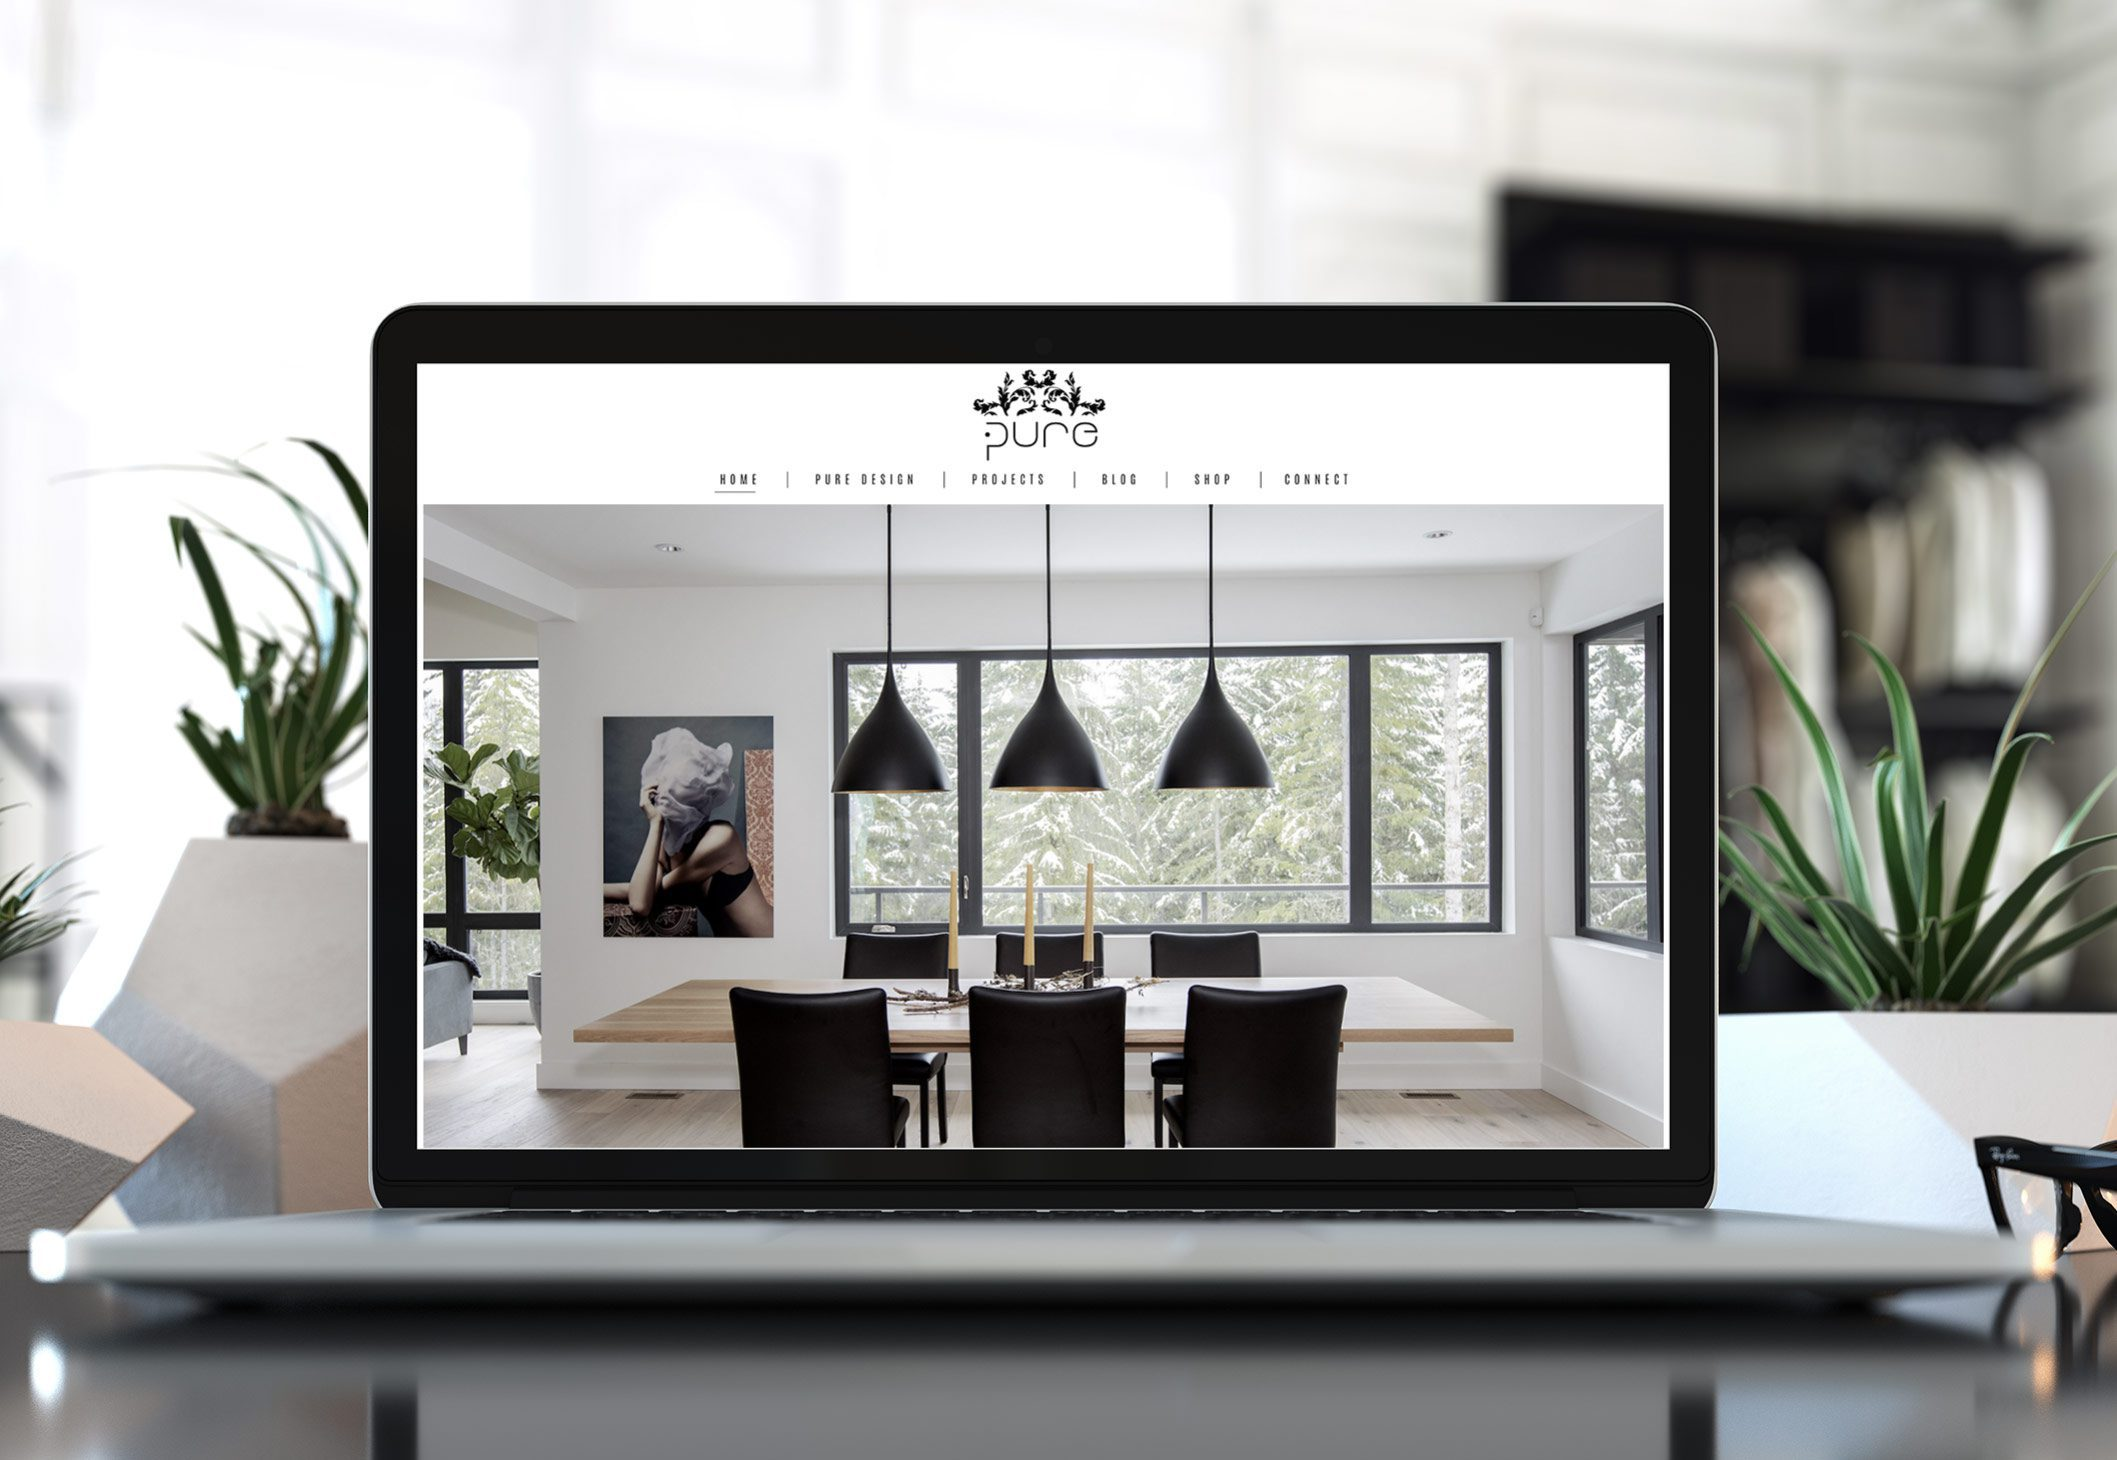 Ami mckay pure design new website oliver spence